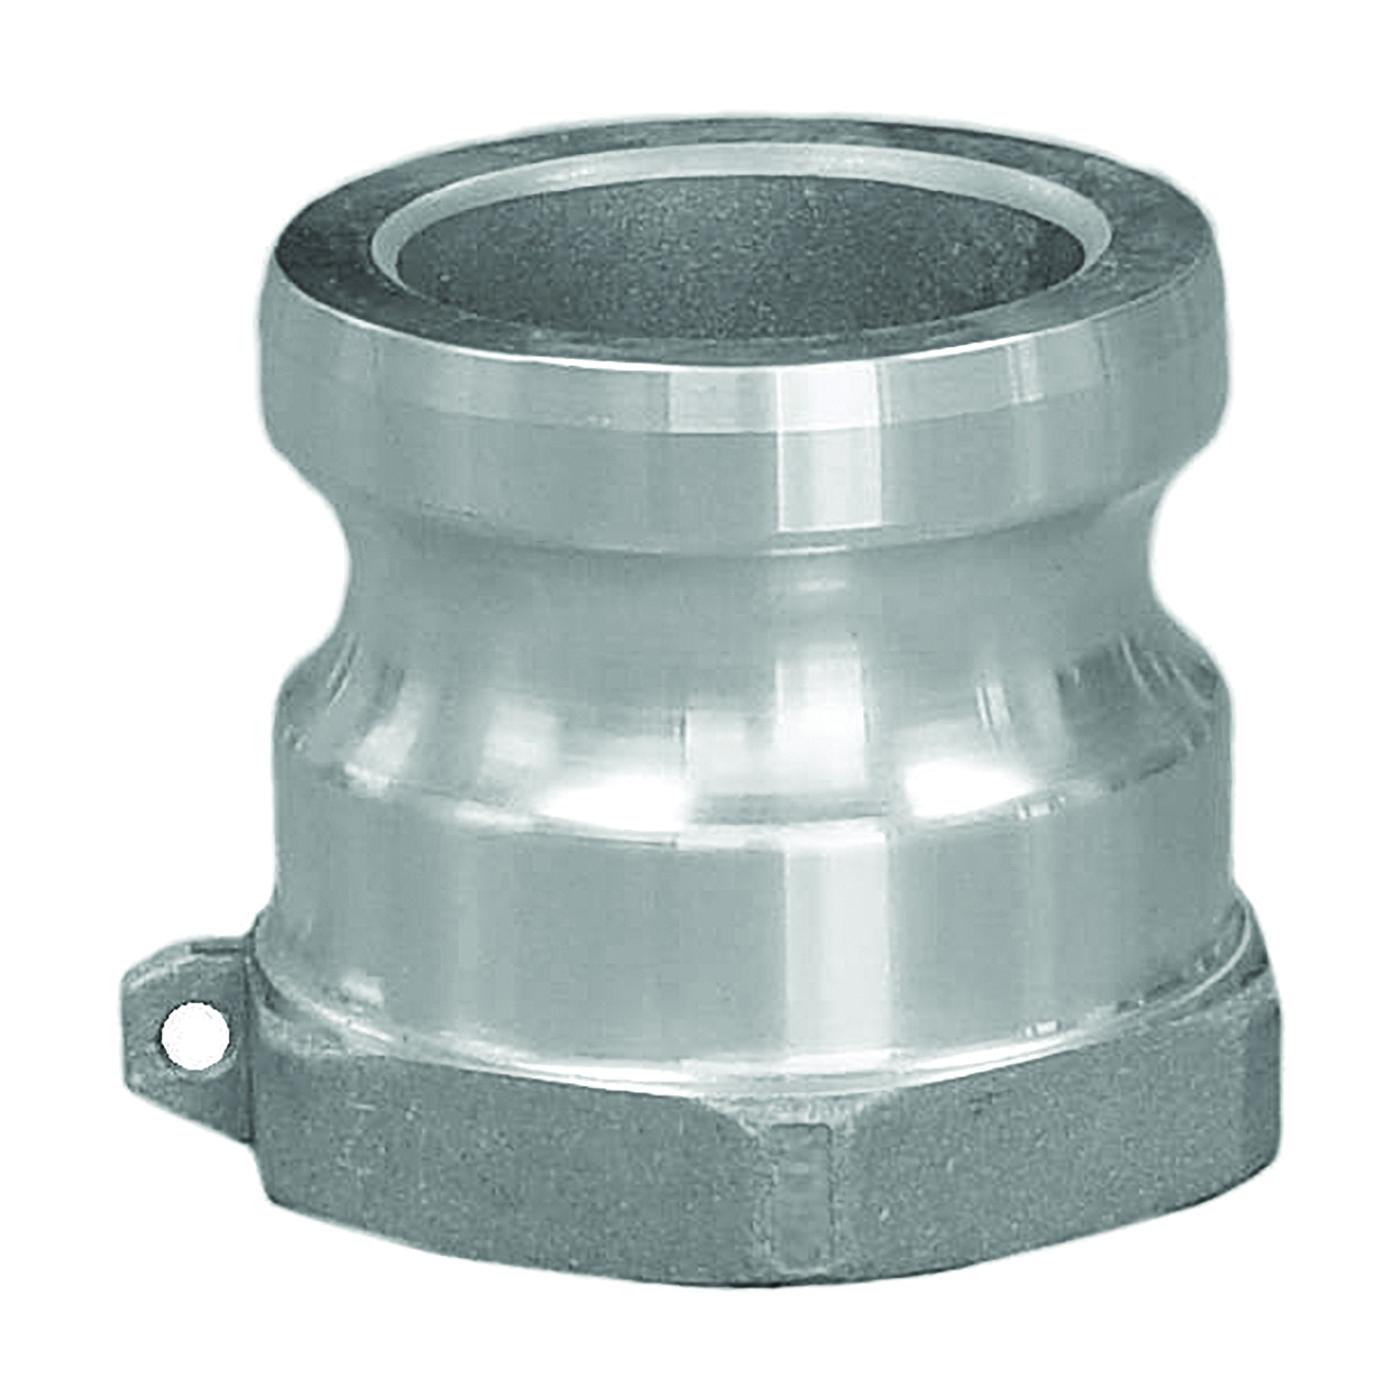 Picture of ABBOTT RUBBER QA-200-DC Hose Coupling, 2 in, FNPT, Aluminum